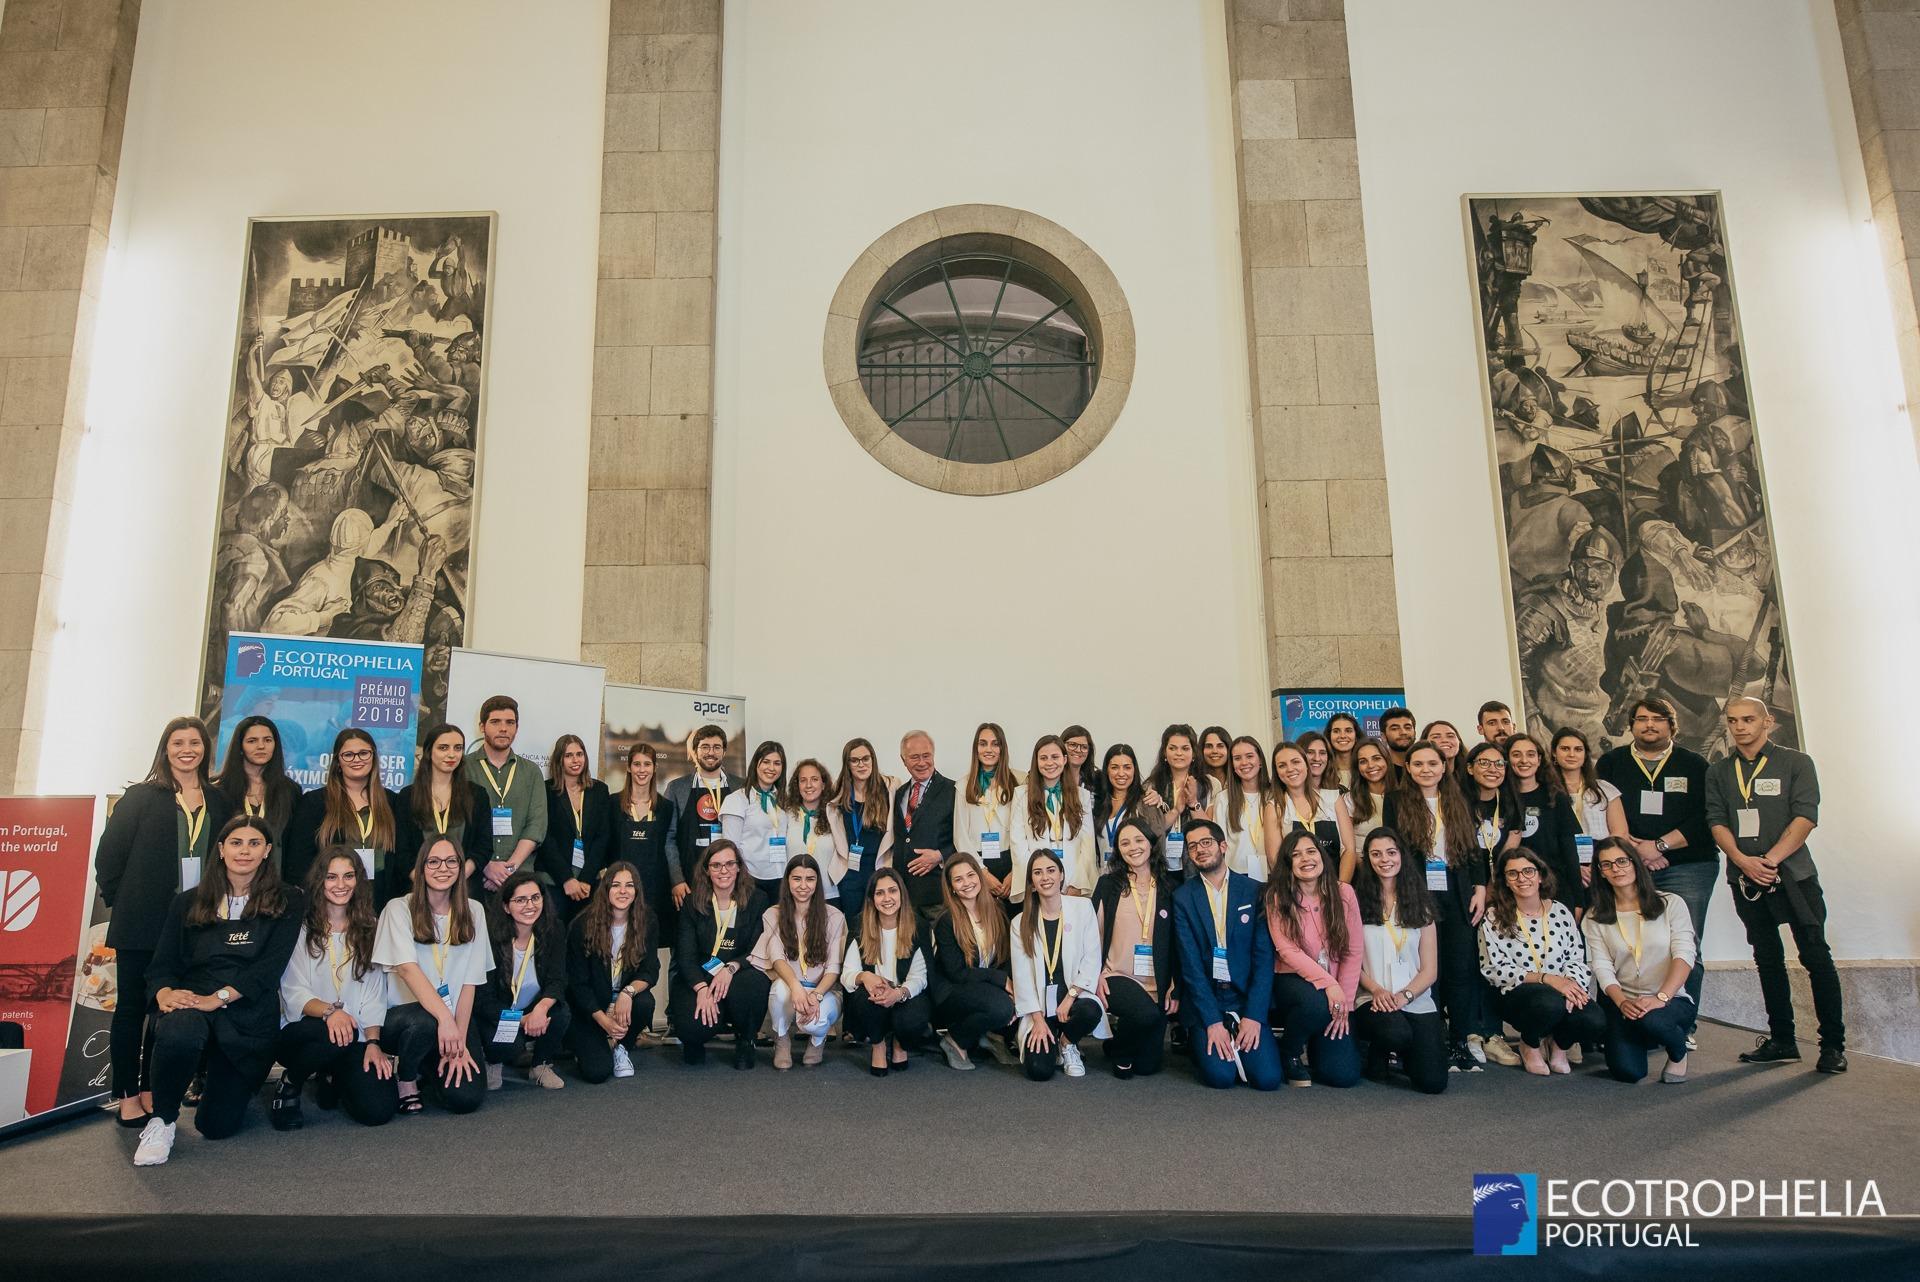 participantes ecotrophelia portugal 2018